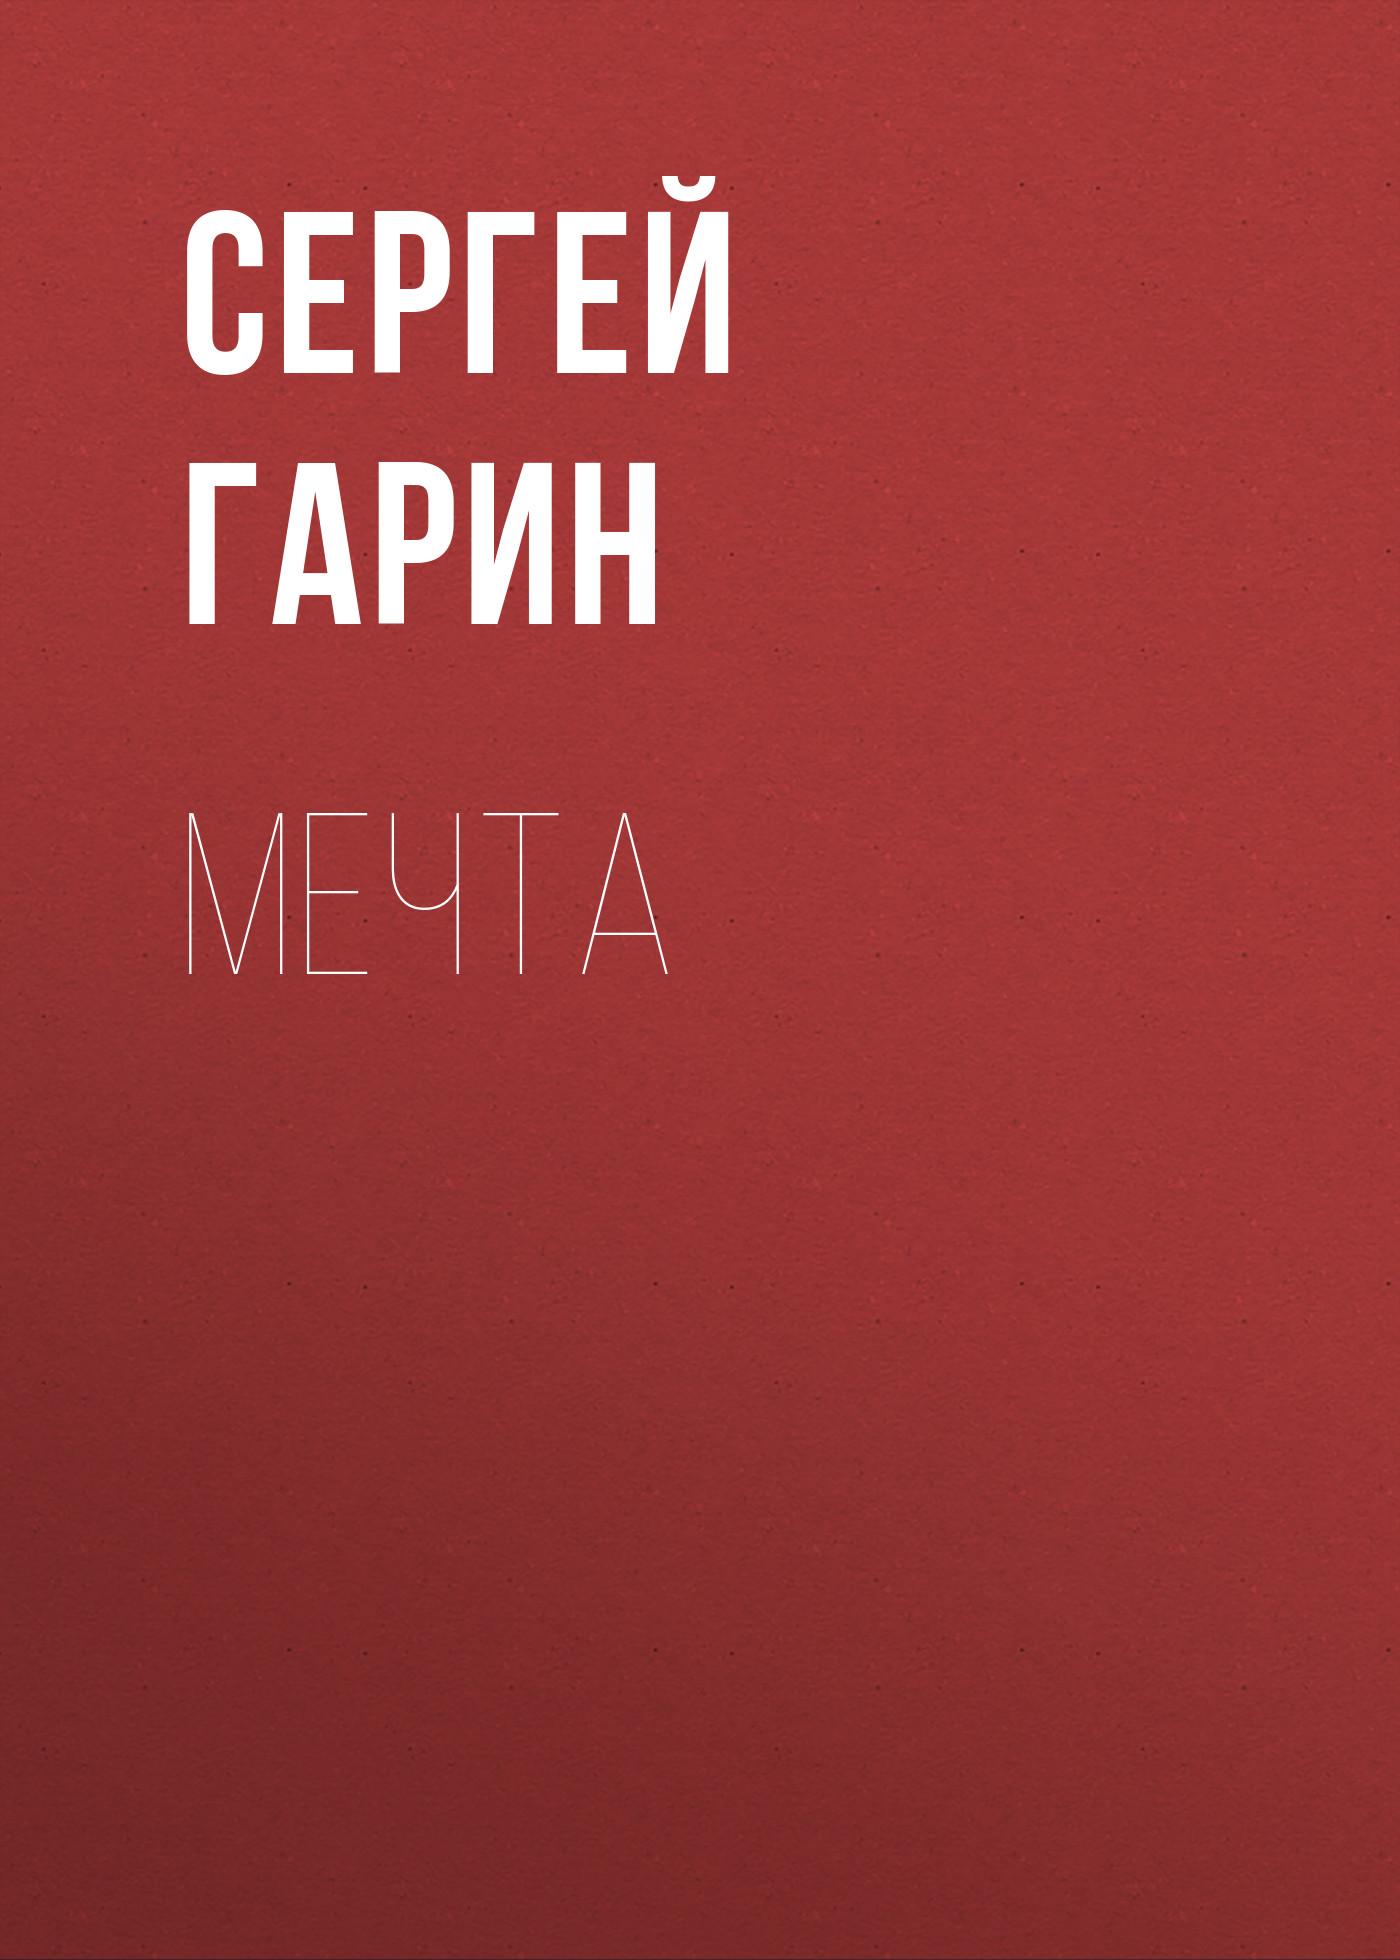 Сергей Гарин Мечта